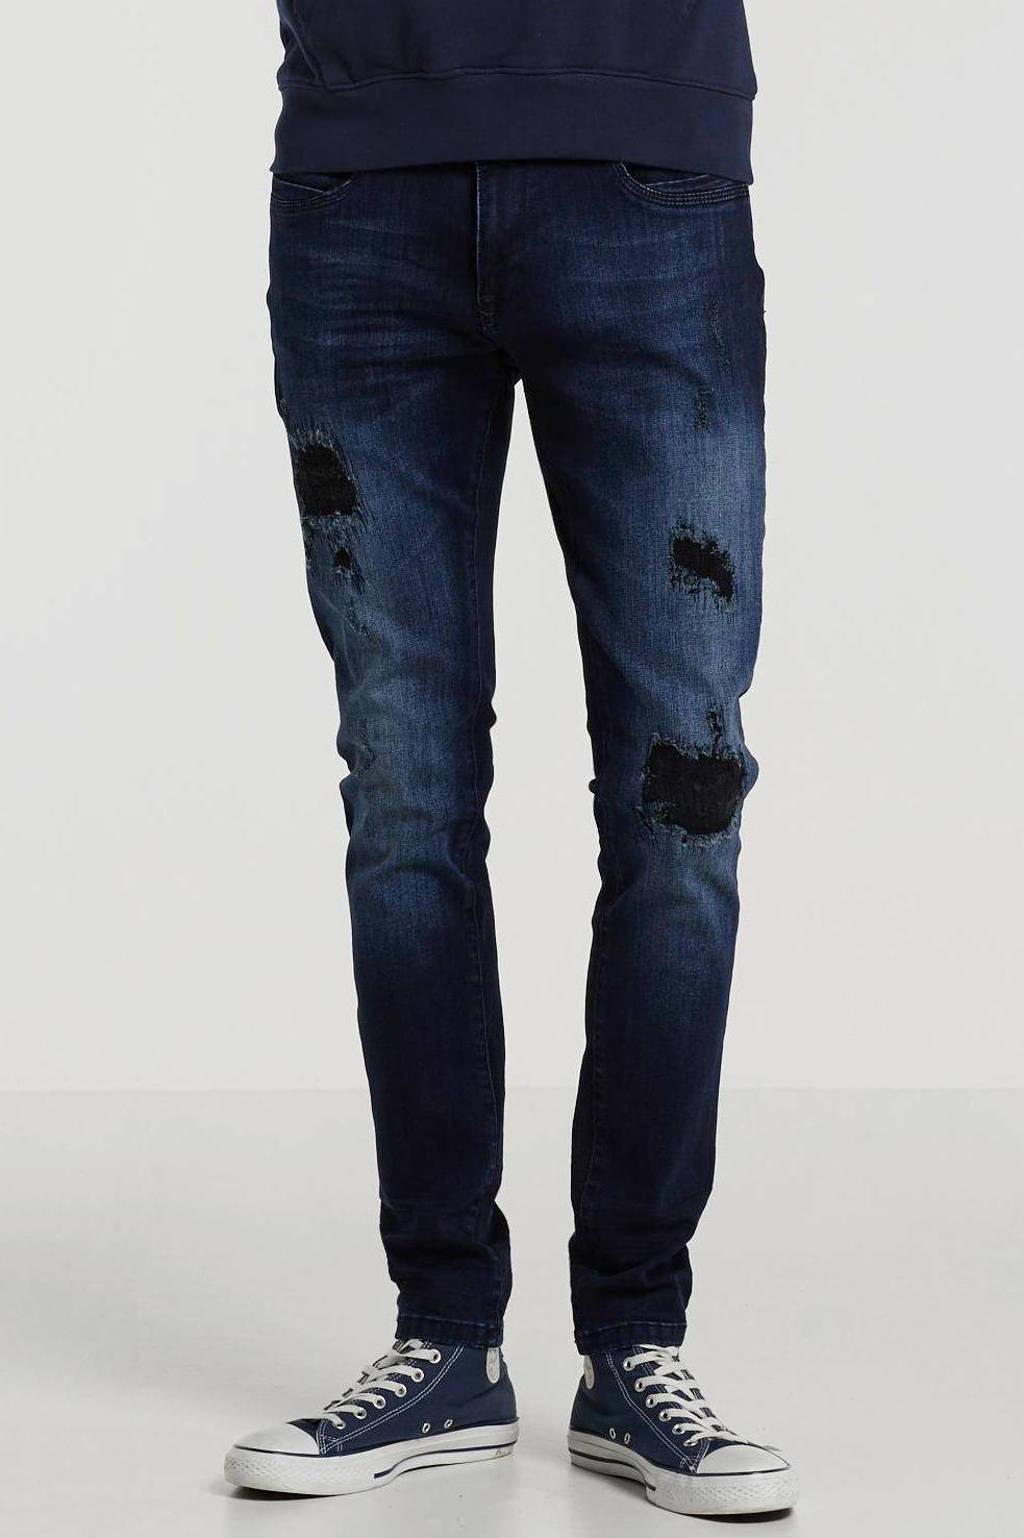 GABBIANO skinny fit jeans Ultimo dark blue destroyed, Drak blue destryed